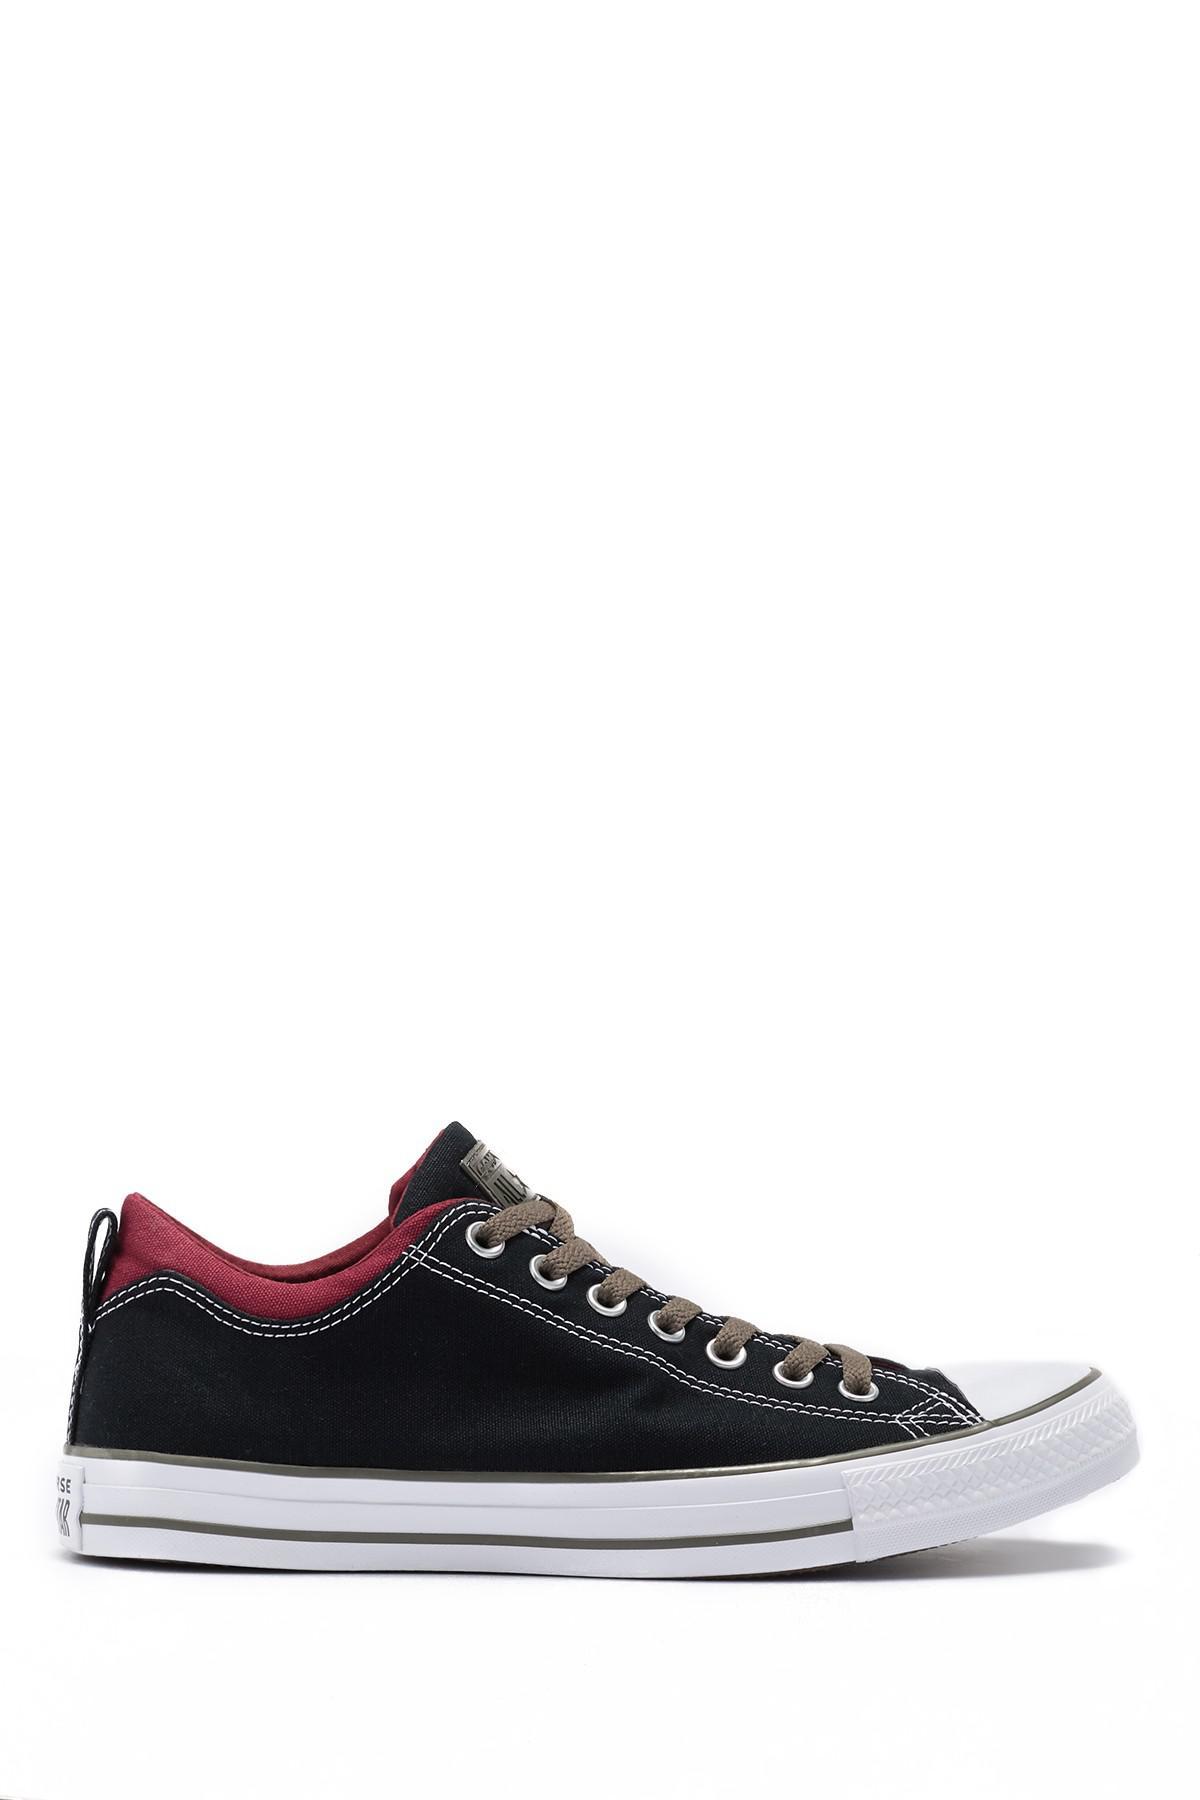 ed47f8933a26 Lyst - Converse Dual Collar Sneaker (unisex) in Black for Men